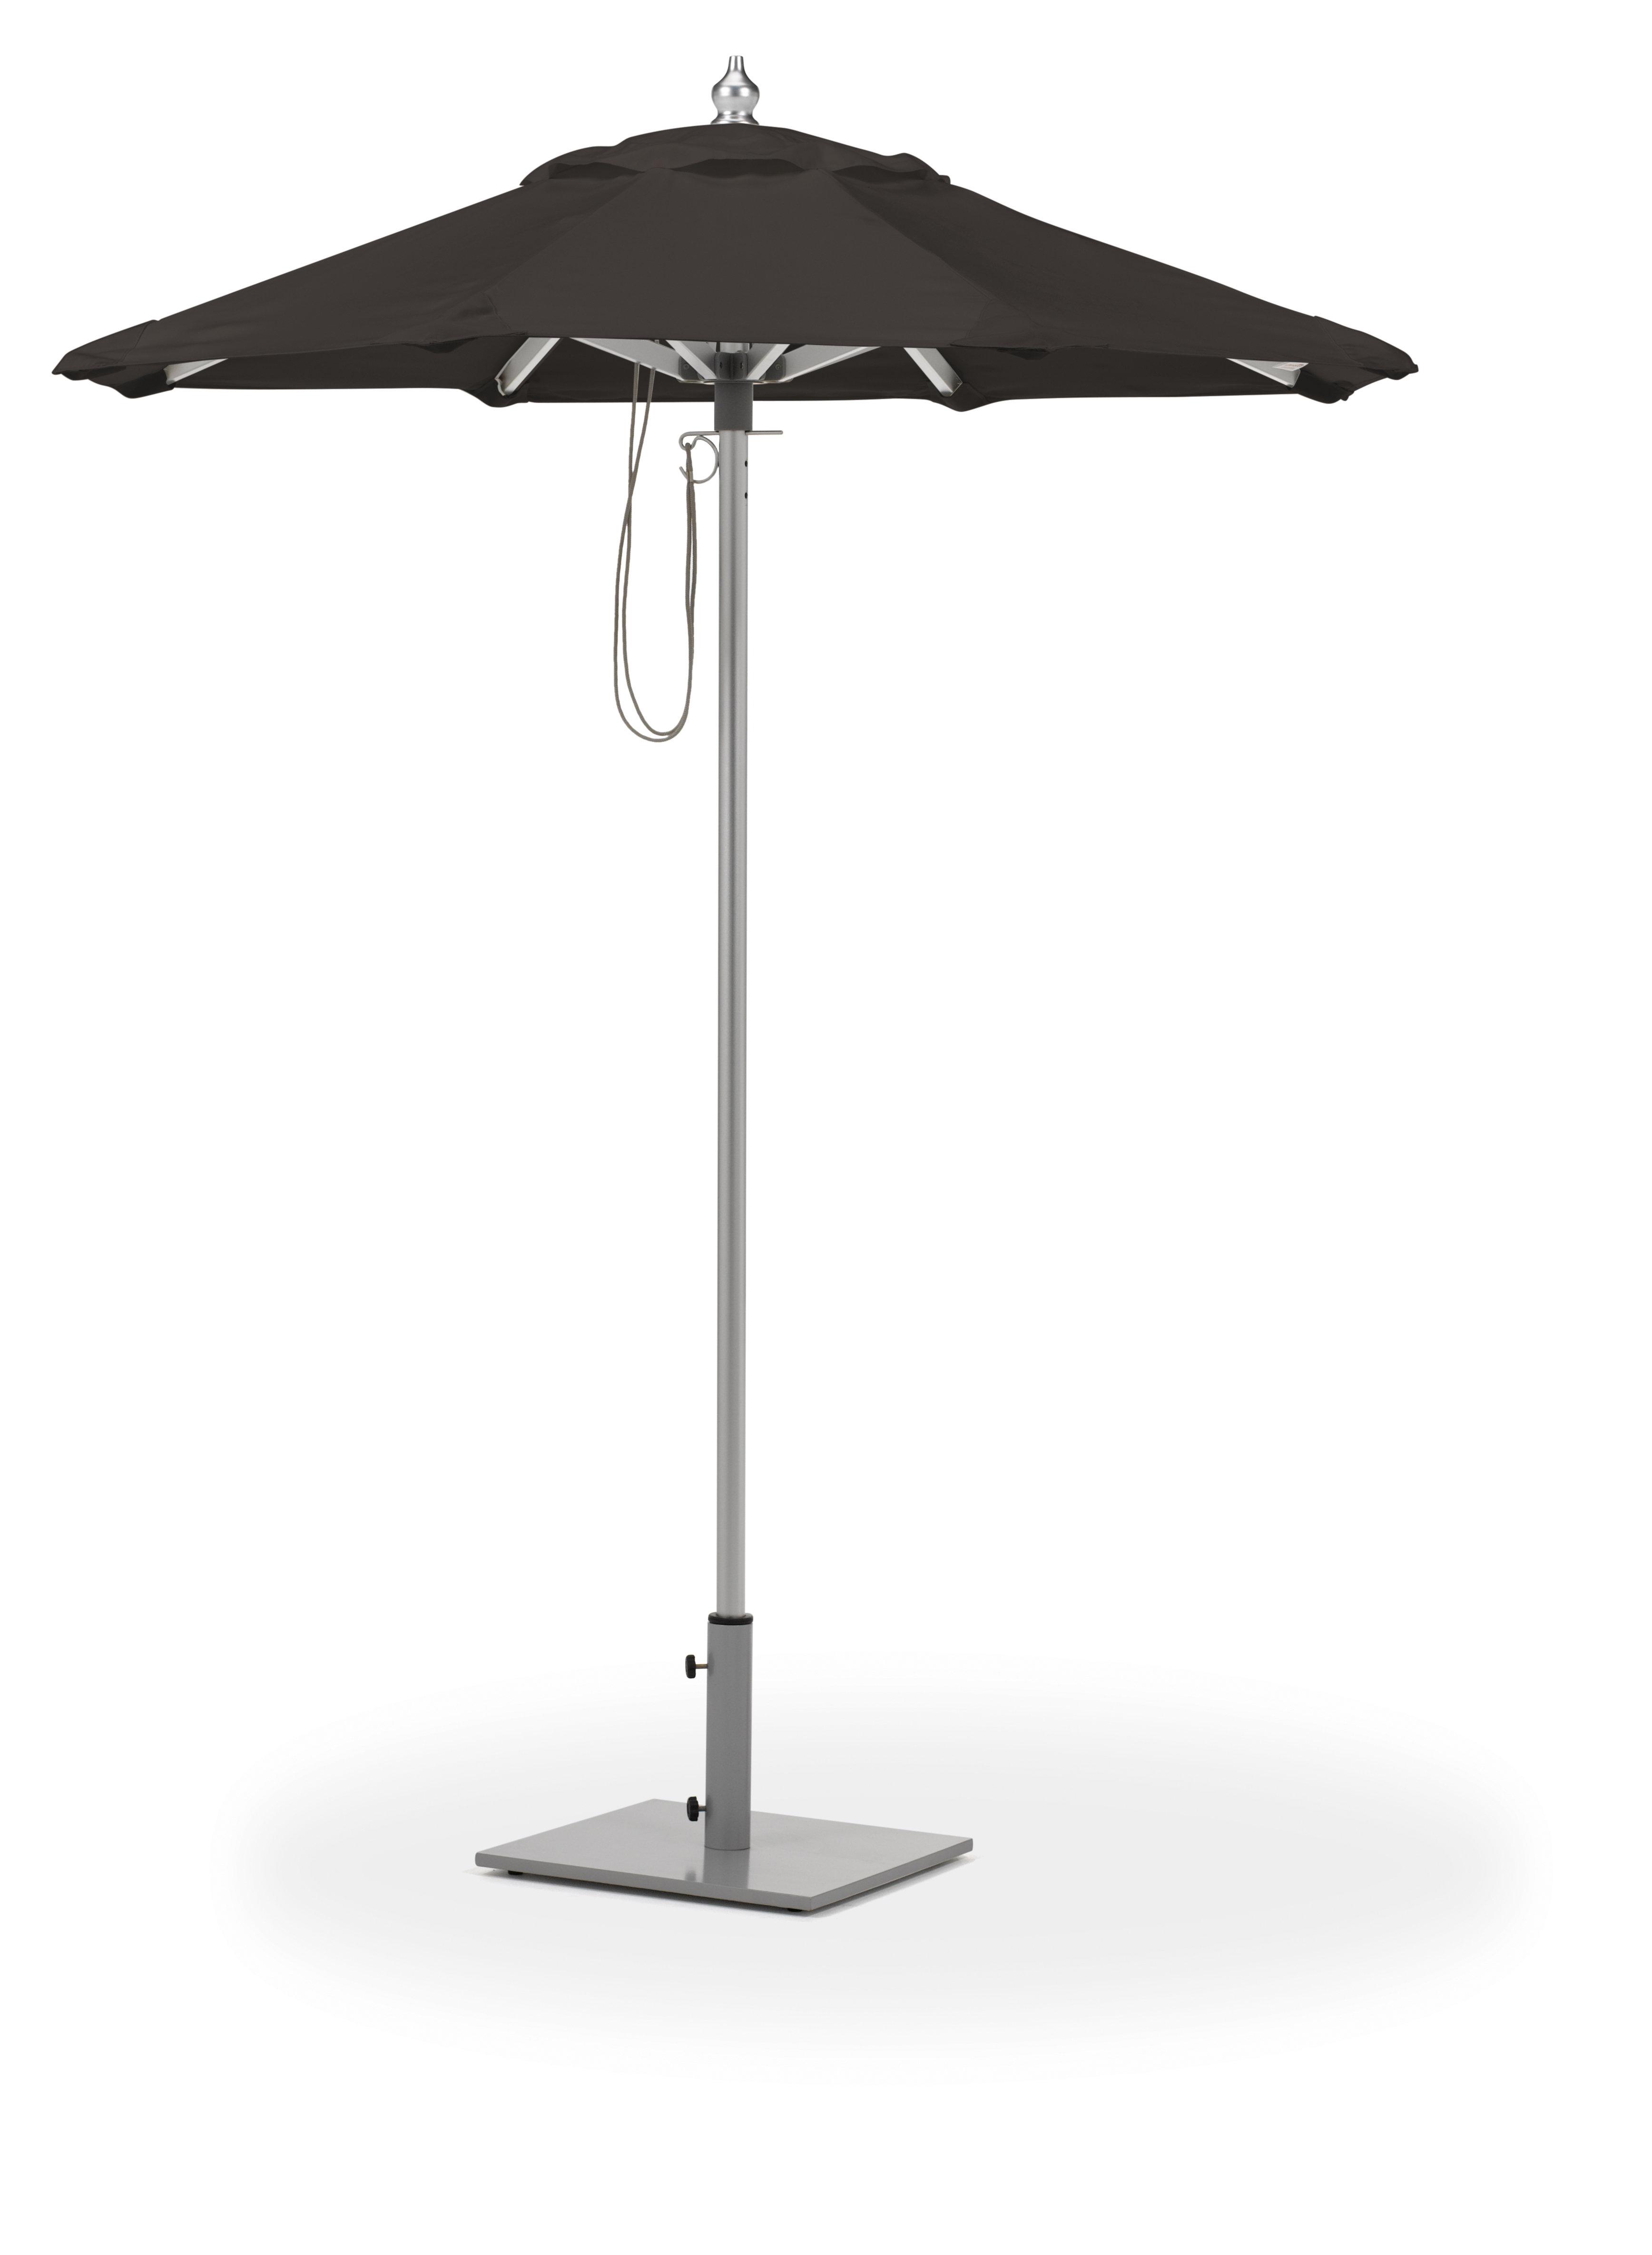 Caravelle Square Market Sunbrella Umbrellas Throughout Newest Stambaugh 6' Market Umbrella (View 16 of 20)